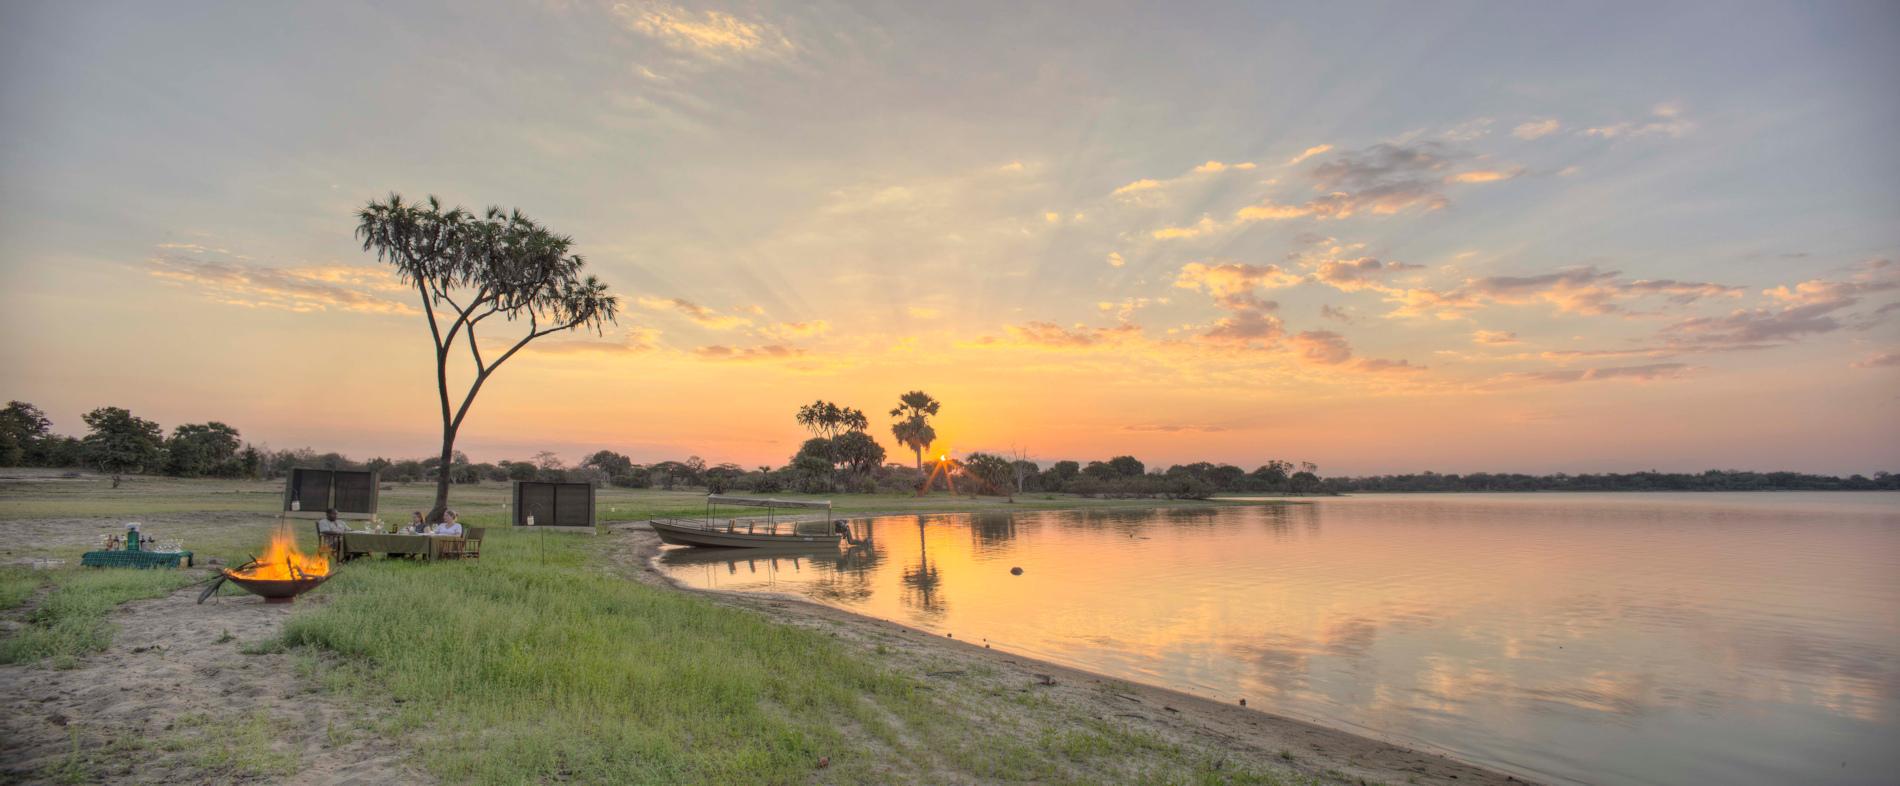 Roho ya Camp Selous Tanzania Asilia Africa Copyright Robert J Ross